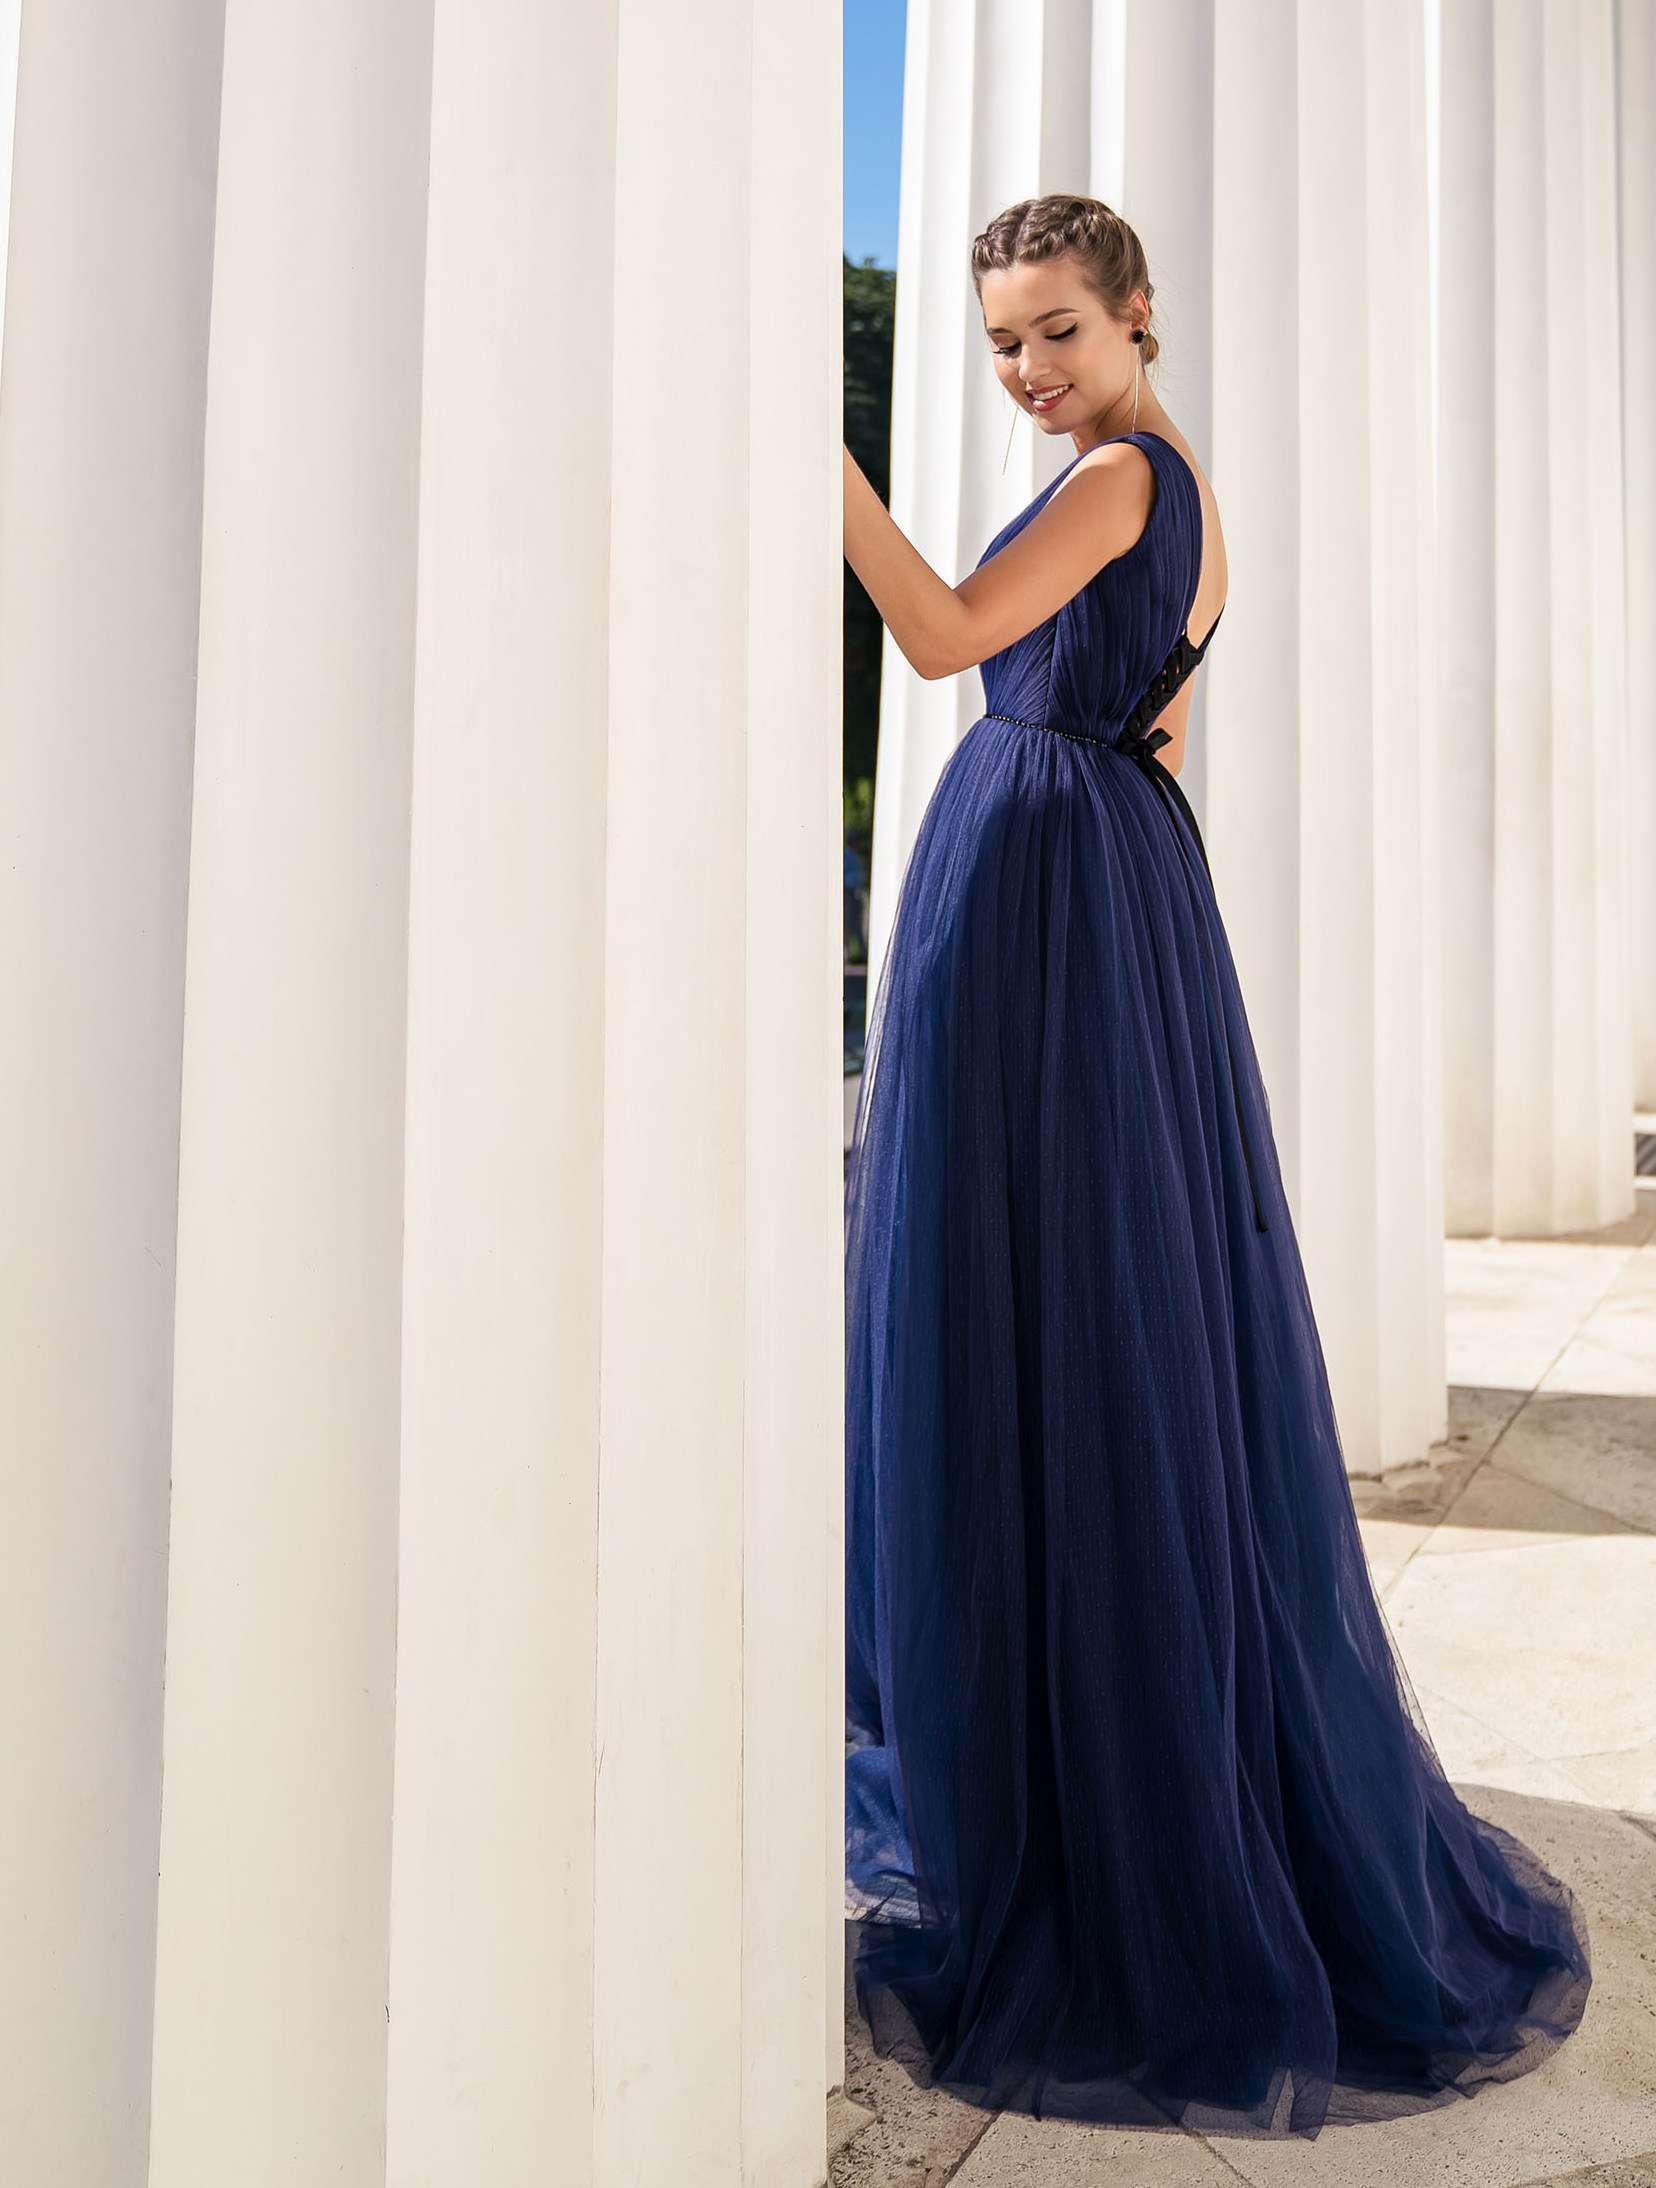 вечернее платье Embry_(3).1800x1800w